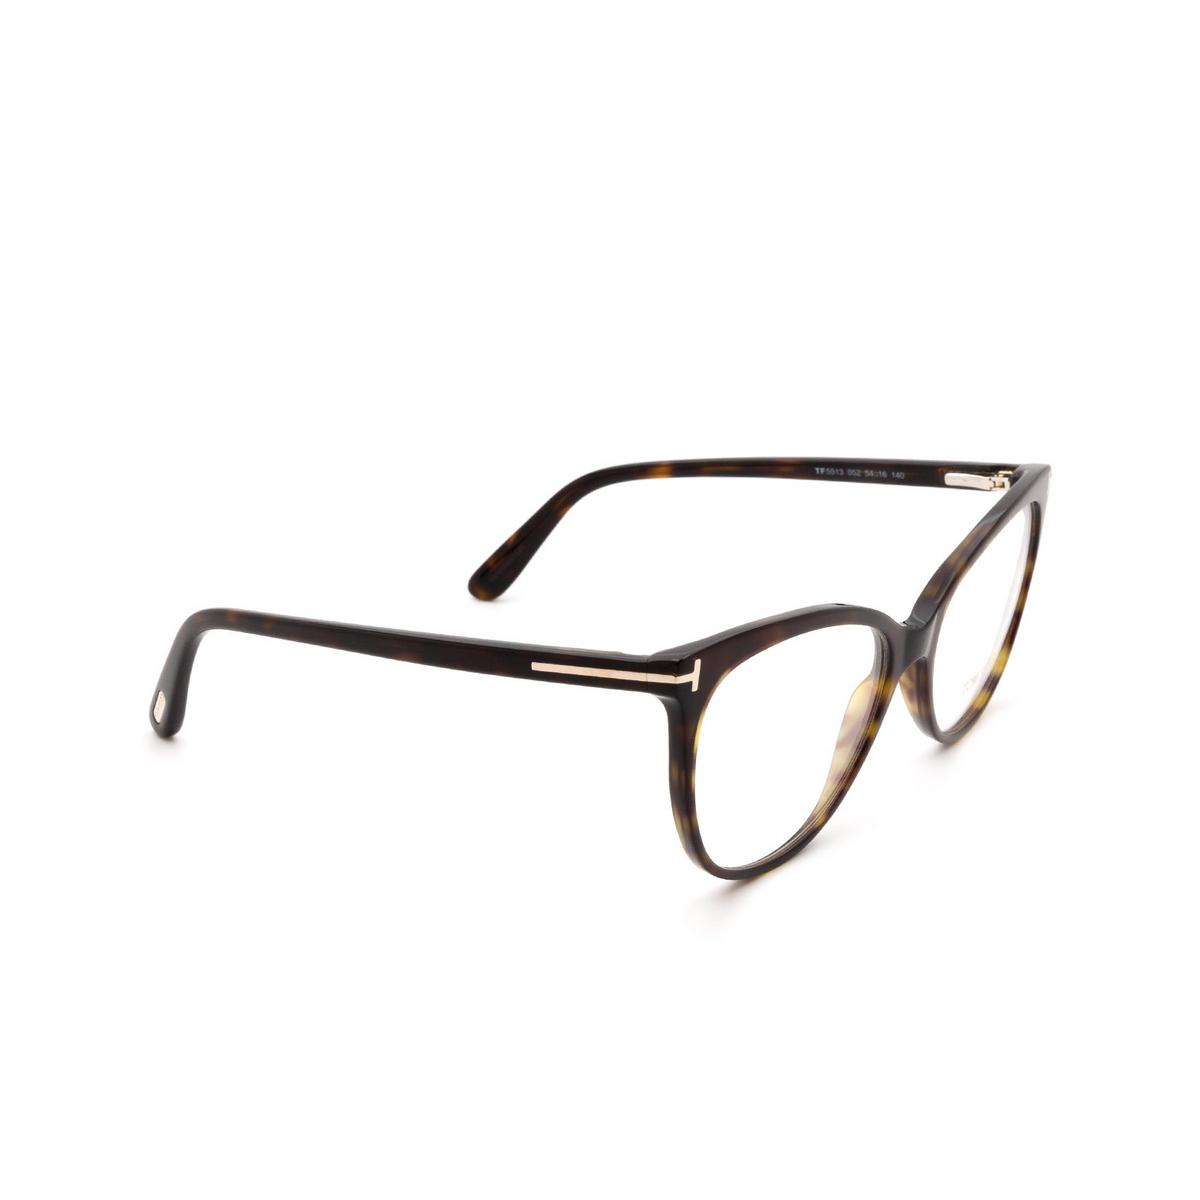 Tom Ford® Cat-eye Eyeglasses: FT5513 color Dark Havana 052 - three-quarters view.